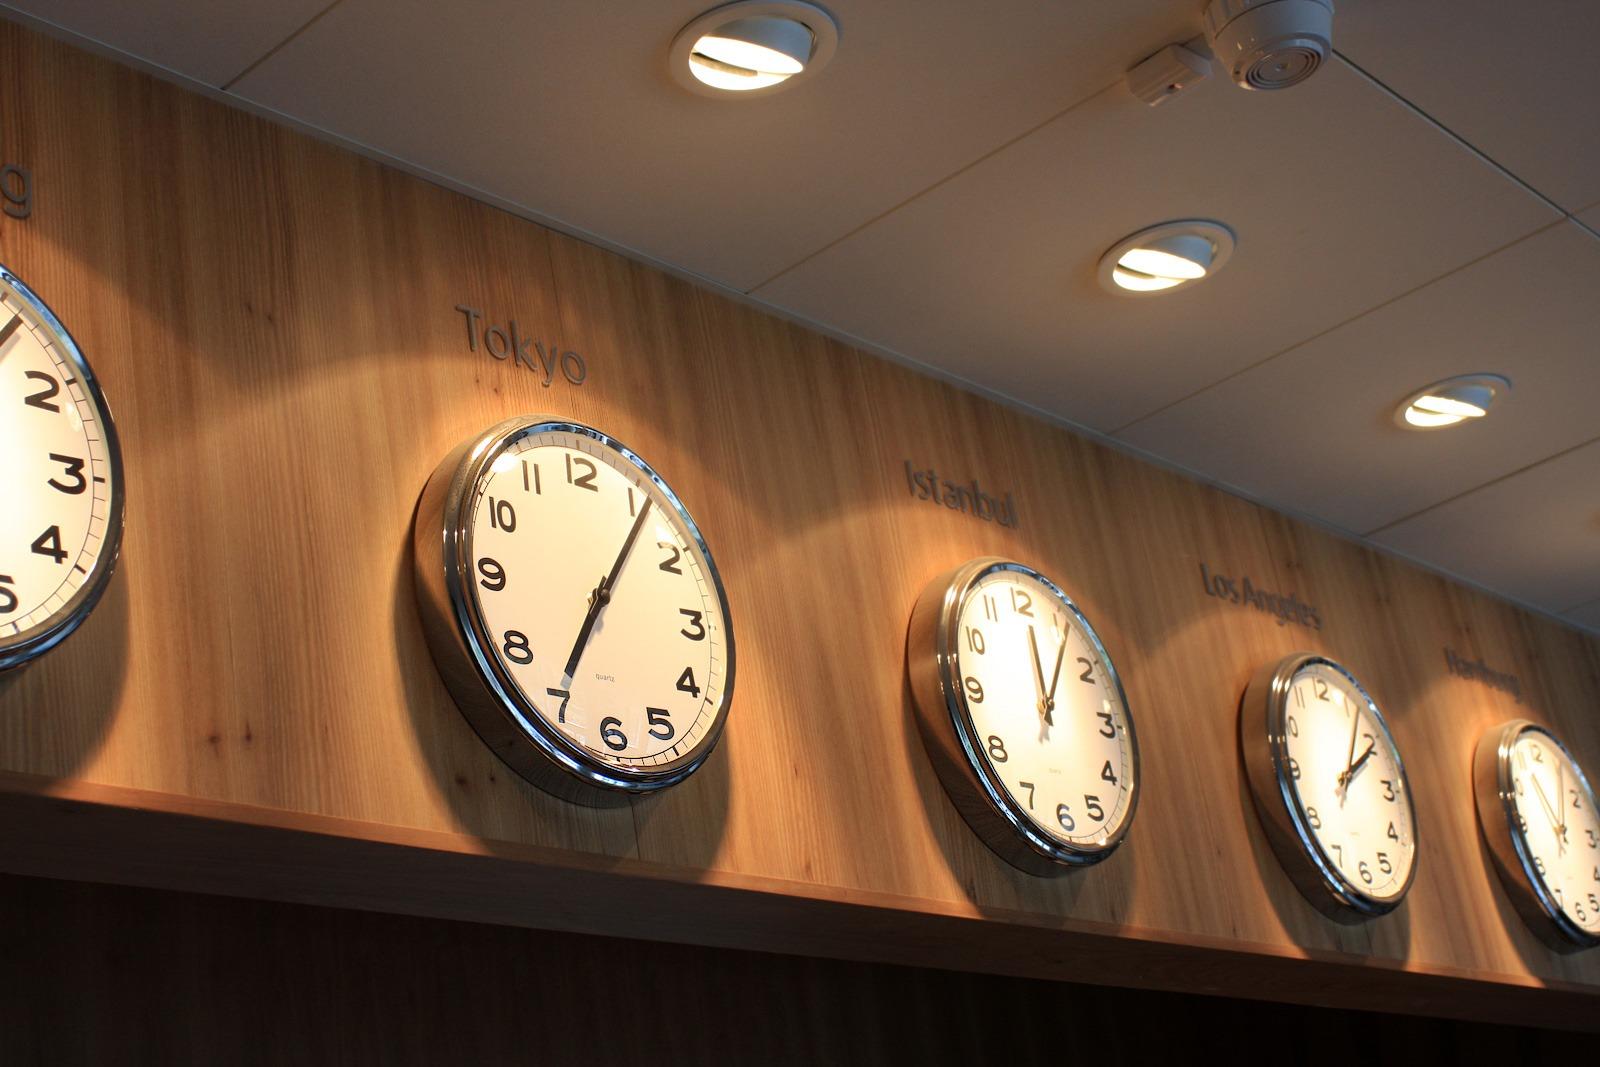 рисепшн, бизнес центр, балтика, reception, business center, baltic